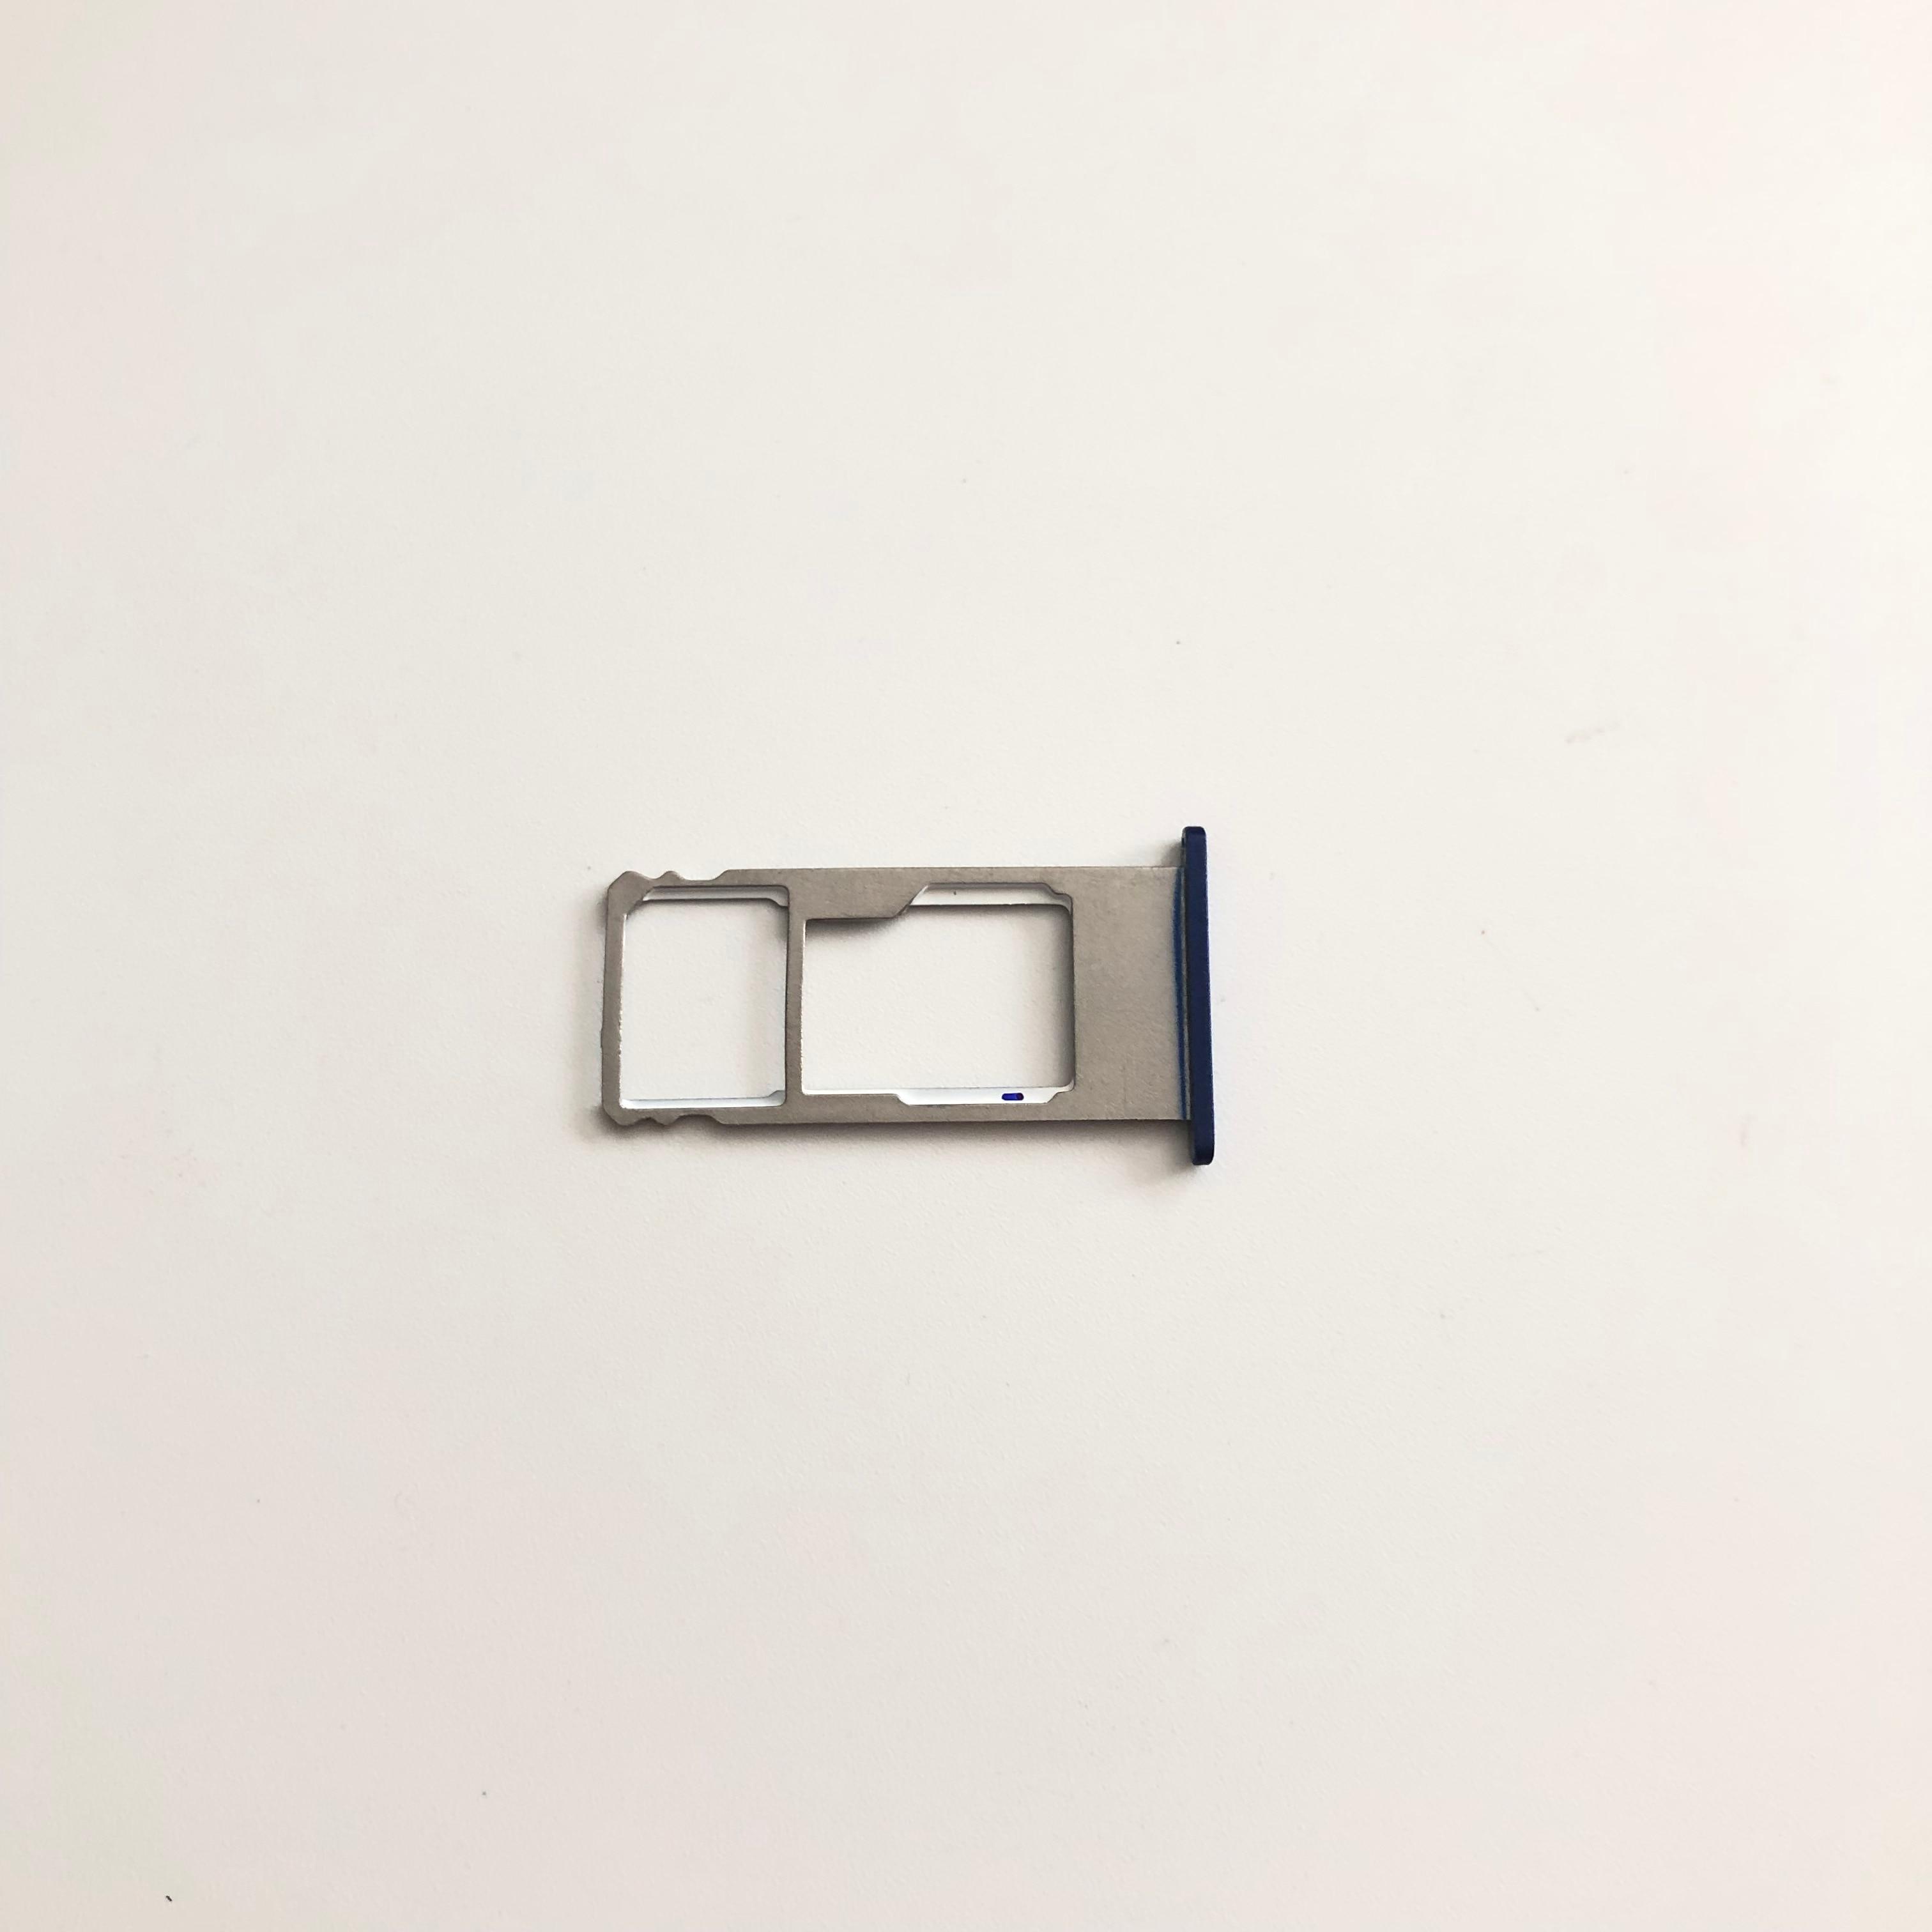 Oukitel U11 Plus Used Sim Card Holder Tray Card Slot For Oukitel U11 Plus MTK6750T Android 7.0 5.7